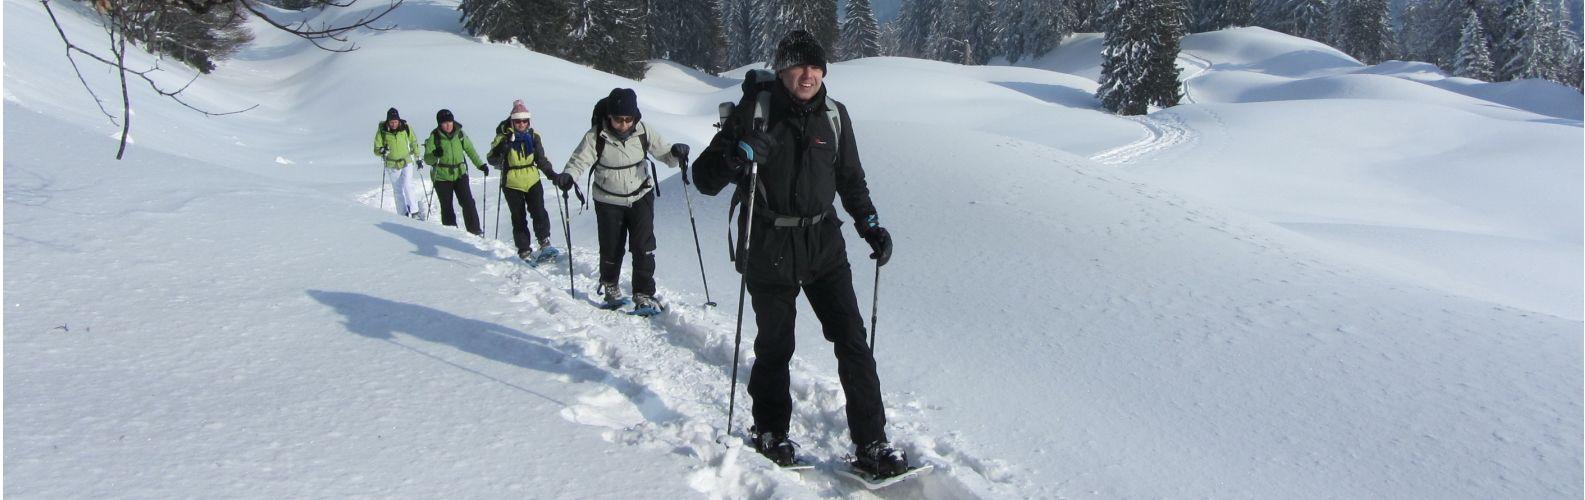 Schneeschuhtour Staufner Haus